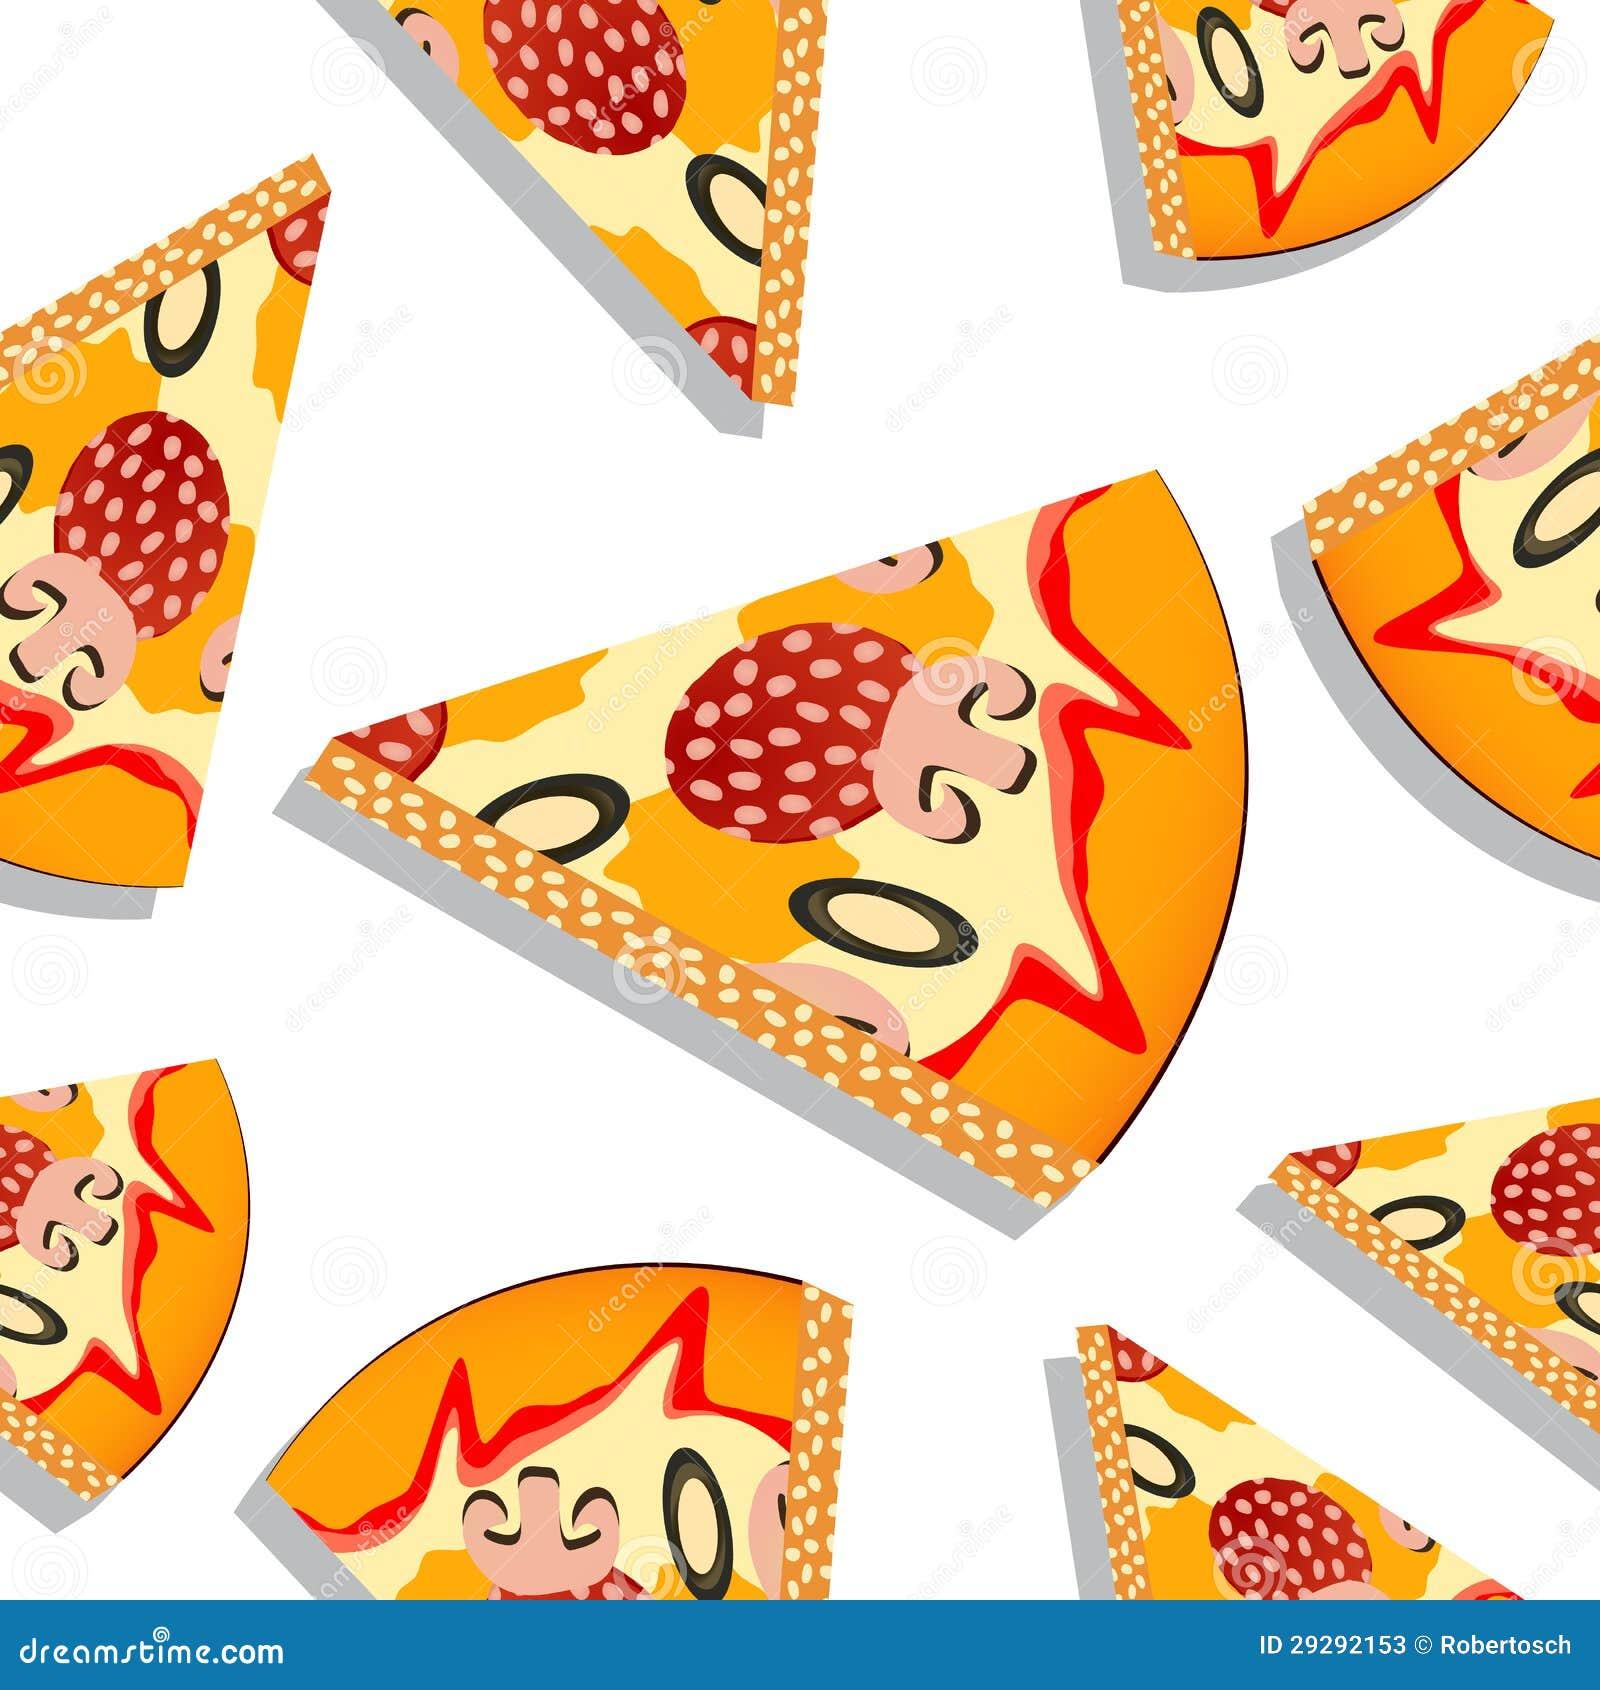 Pizza Slice Pattern Stock Photos - Image: 29292153